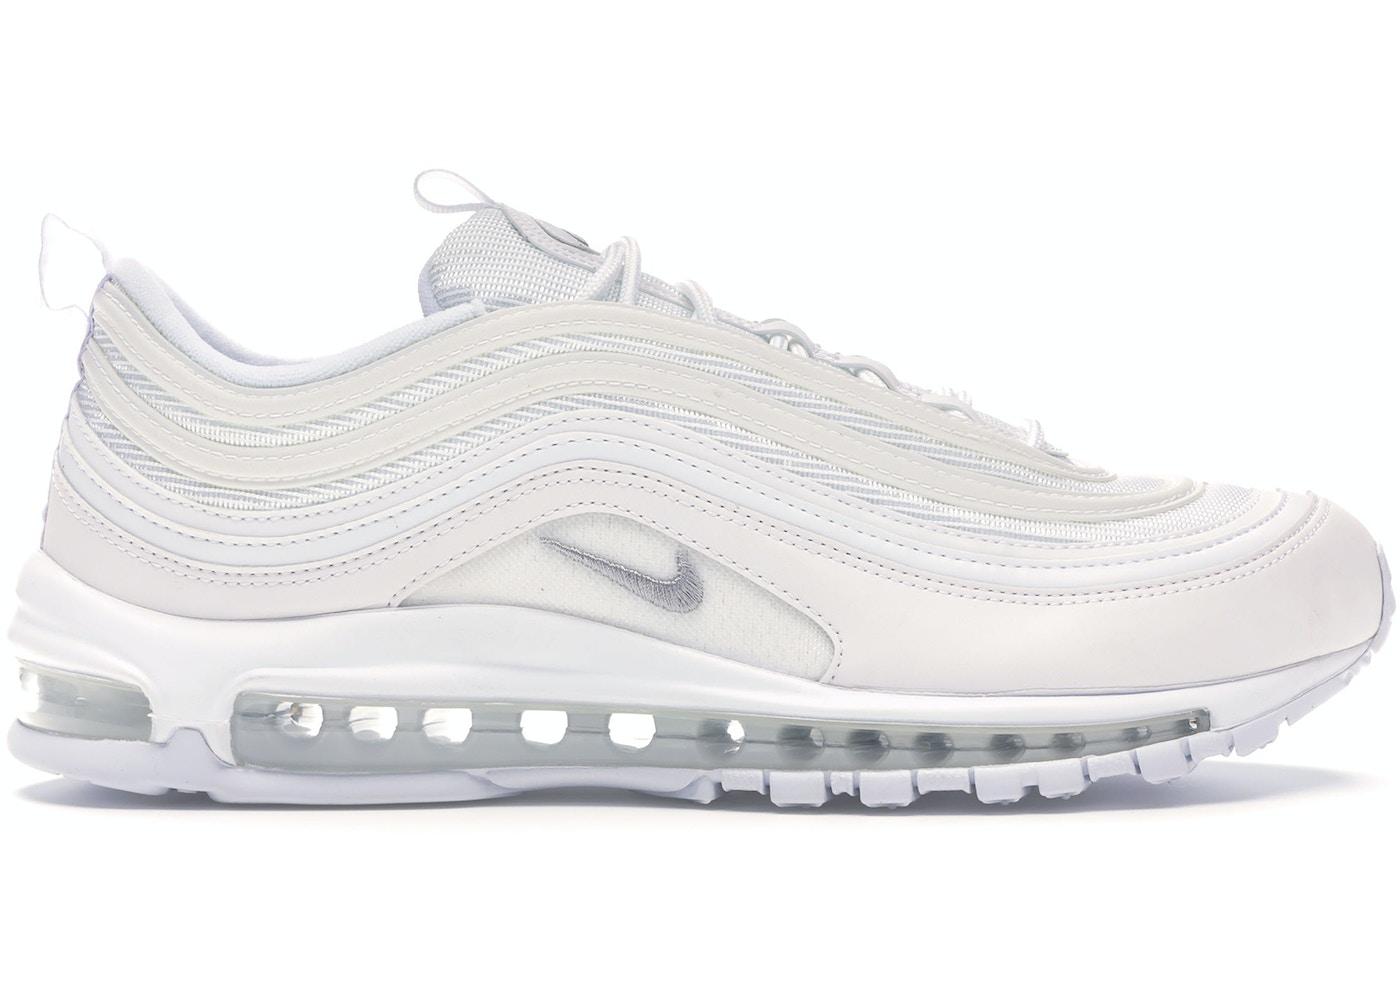 Último estático mensual  Nike Air Max 97 Triple White Wolf Grey - 921826-101